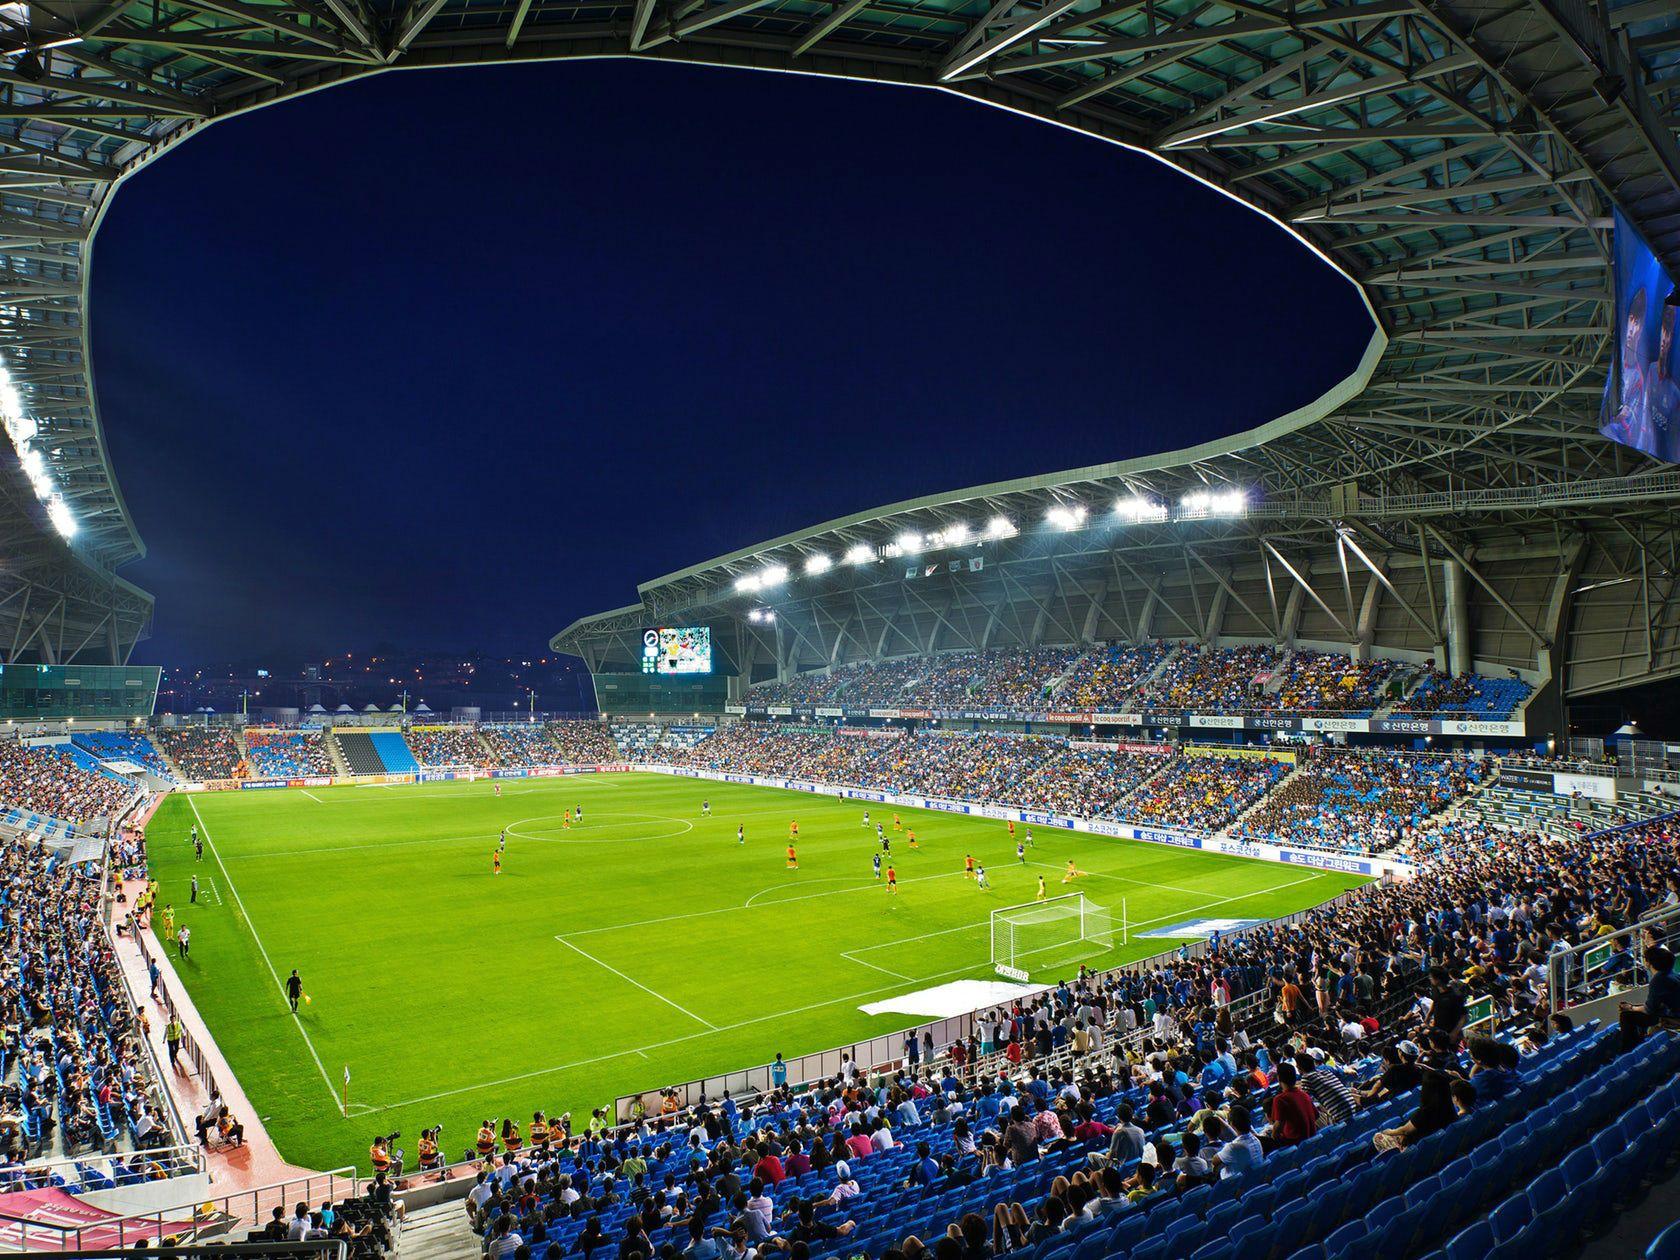 Incheon Football Stadium Sungui Arena Park Rossetti Arch2o Com In 2020 Football Stadiums Soccer Stadium Stadium